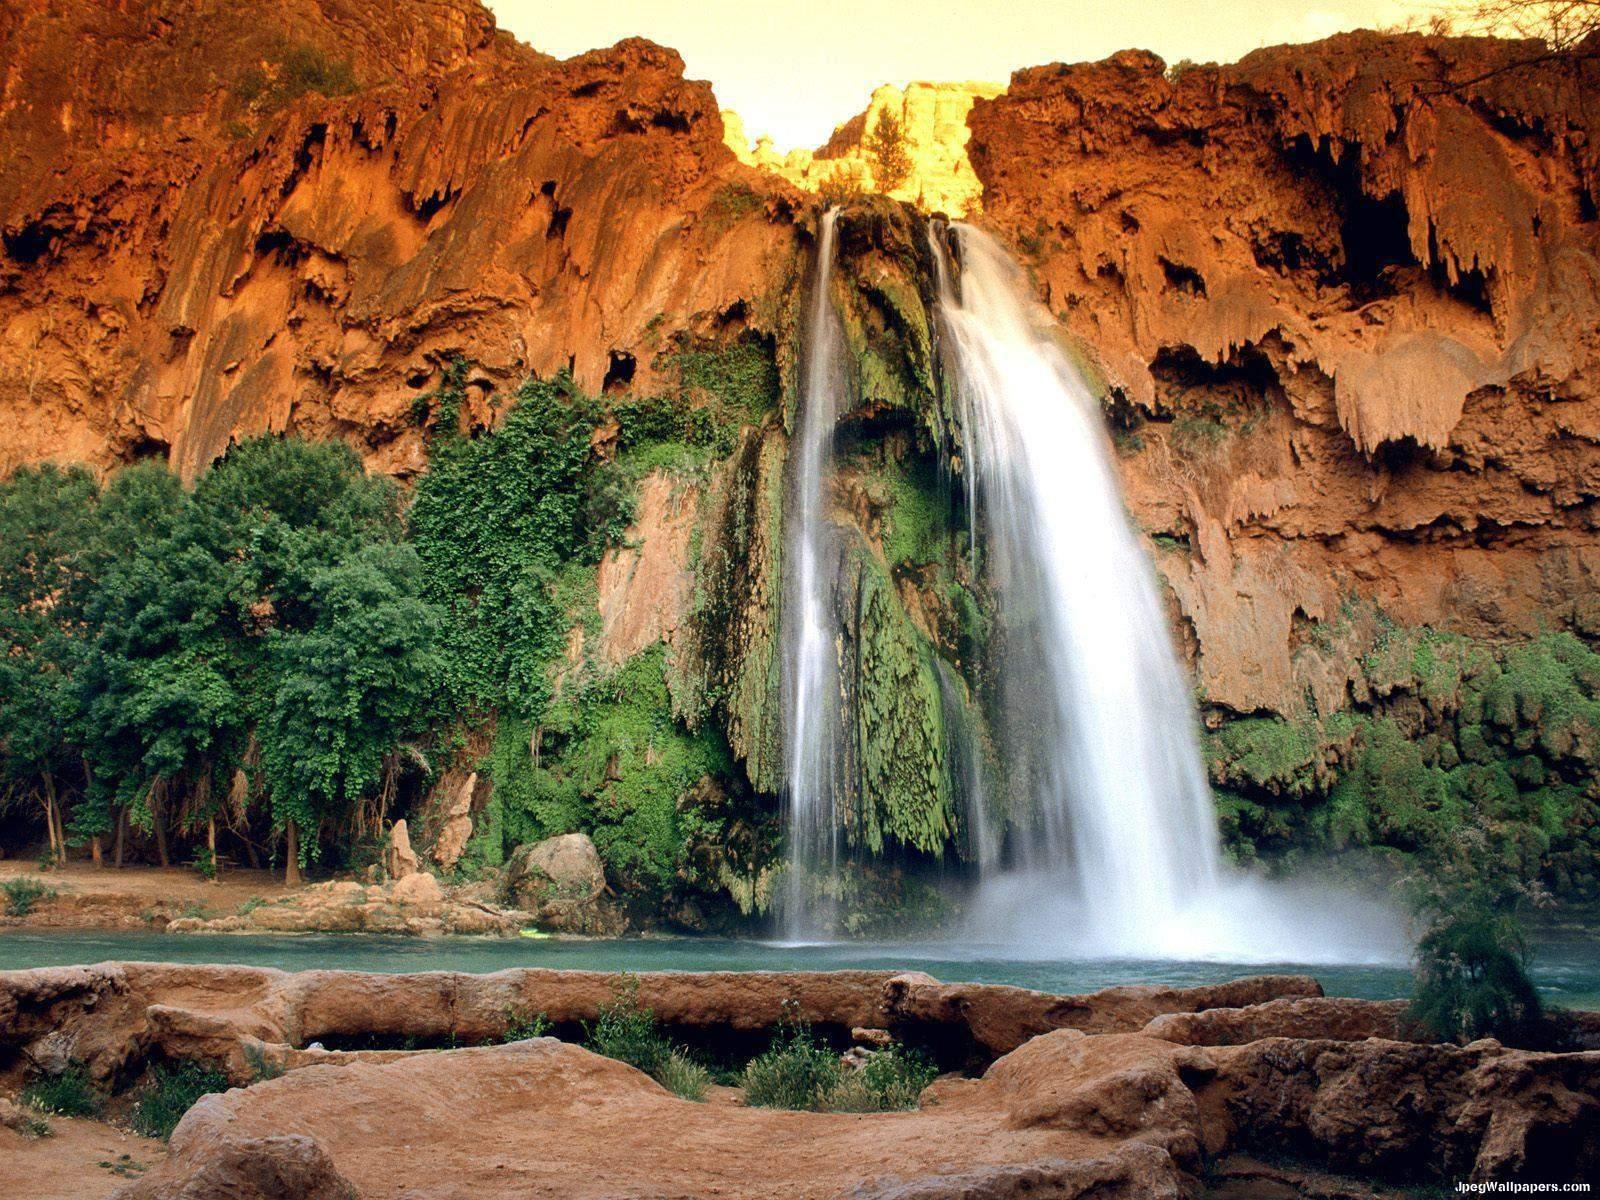 Two-Sisters-Waterfalls-Iguazu-Falls-National-Park-Brazil | The Golden ...